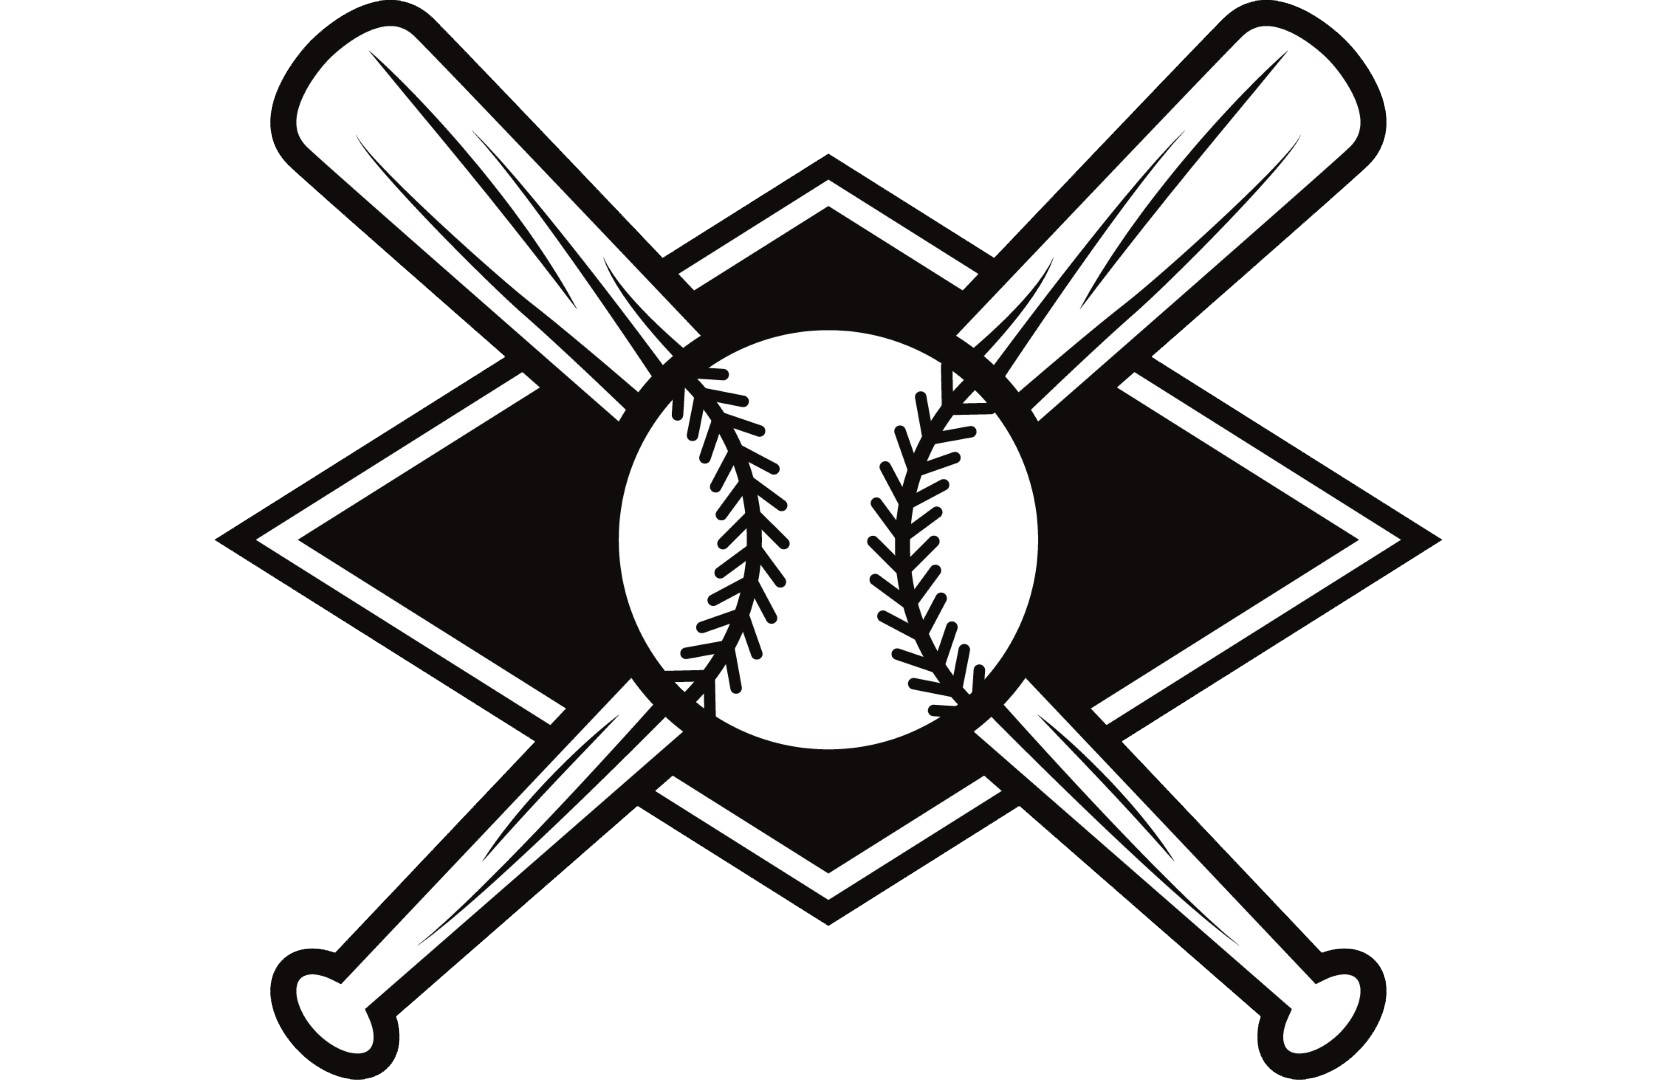 Baseball Bats Batting Clip art Scalable Vector Graphics.